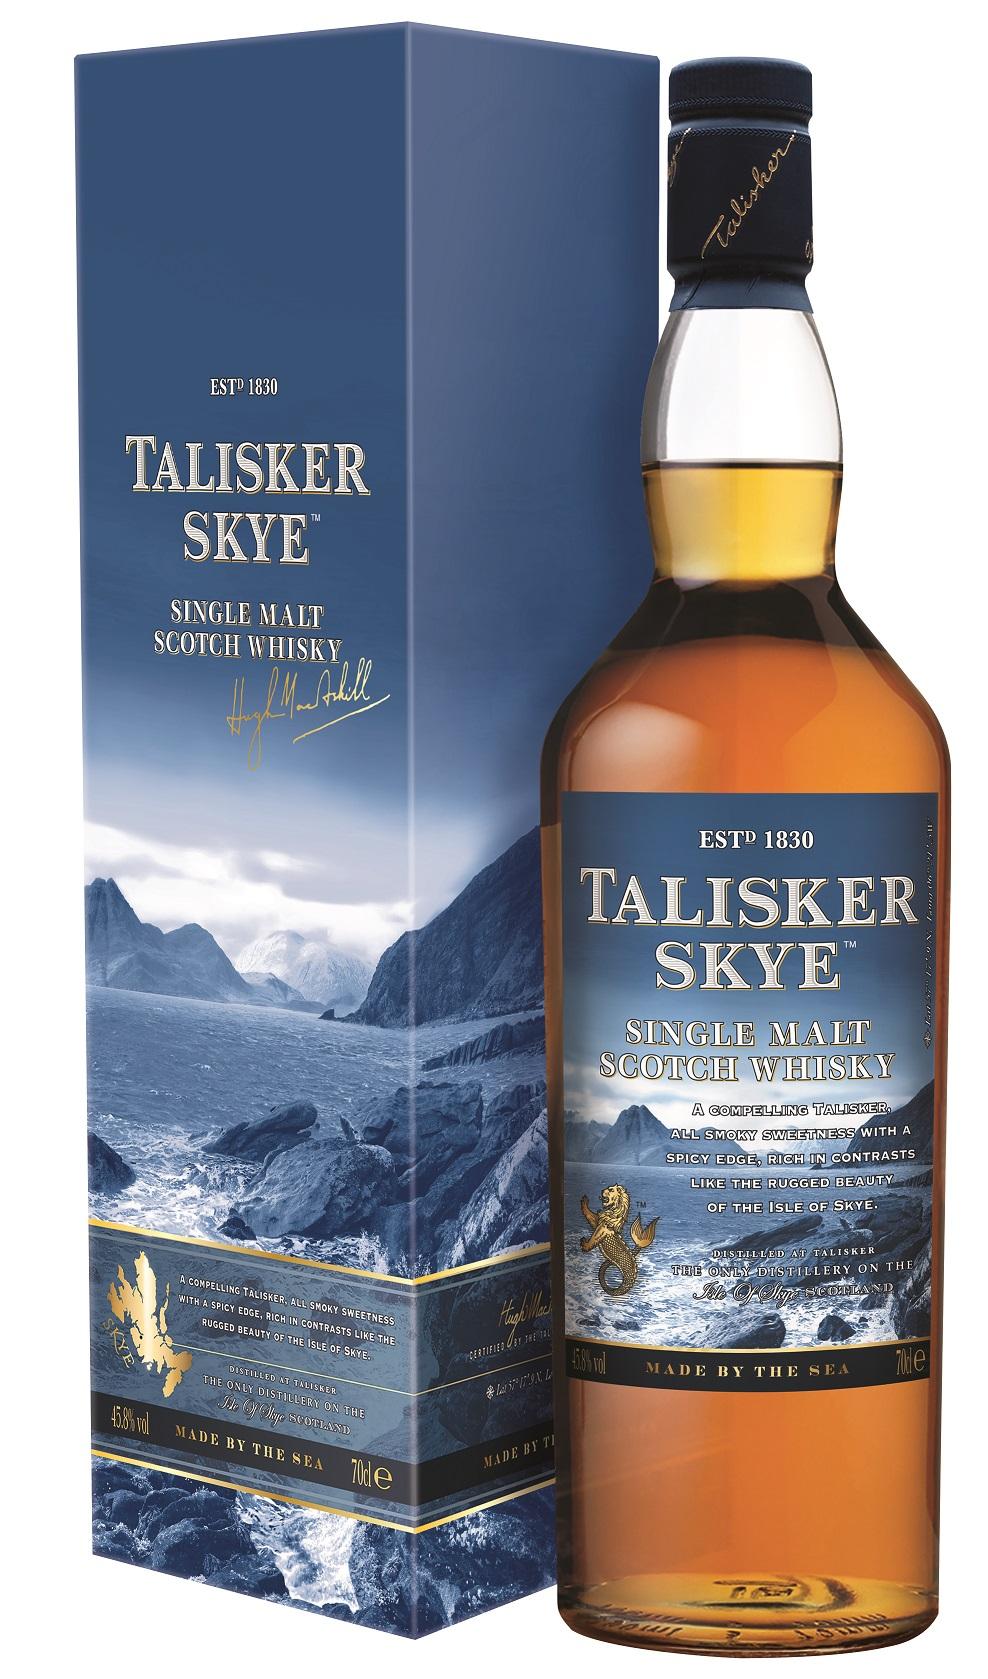 Talisker Skye Single Malt Whisky